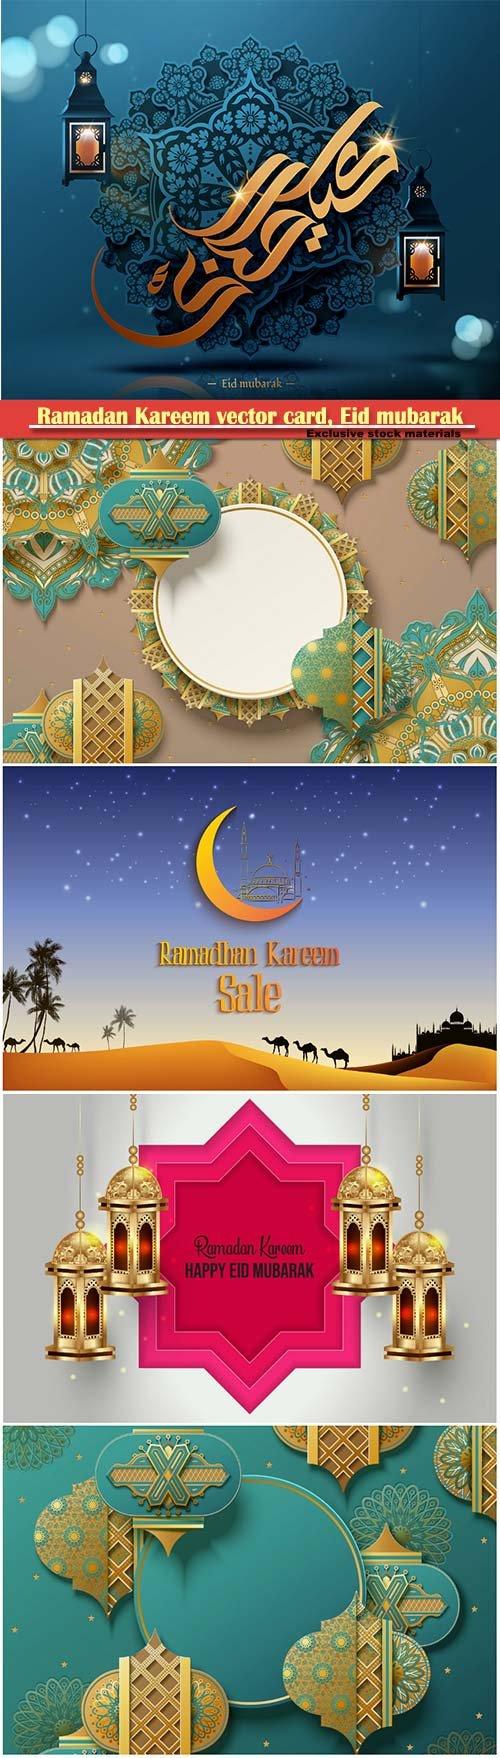 Ramadan Kareem vector card, Eid mubarak calligraphy design templates # 33